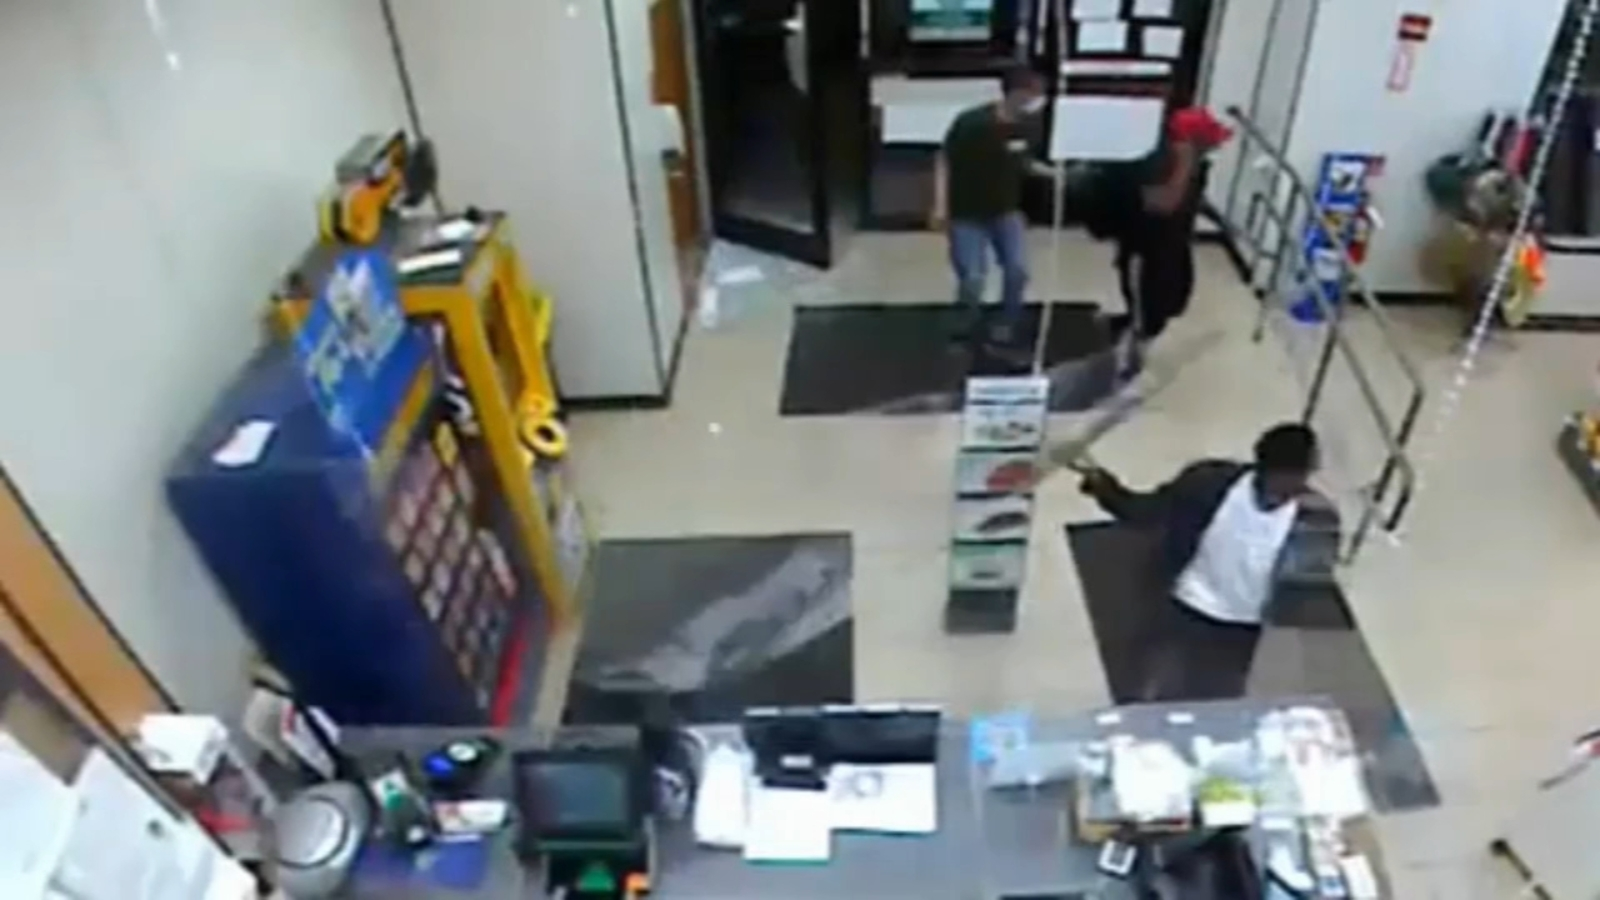 Surveillance video shows Center City 7-Eleven looters